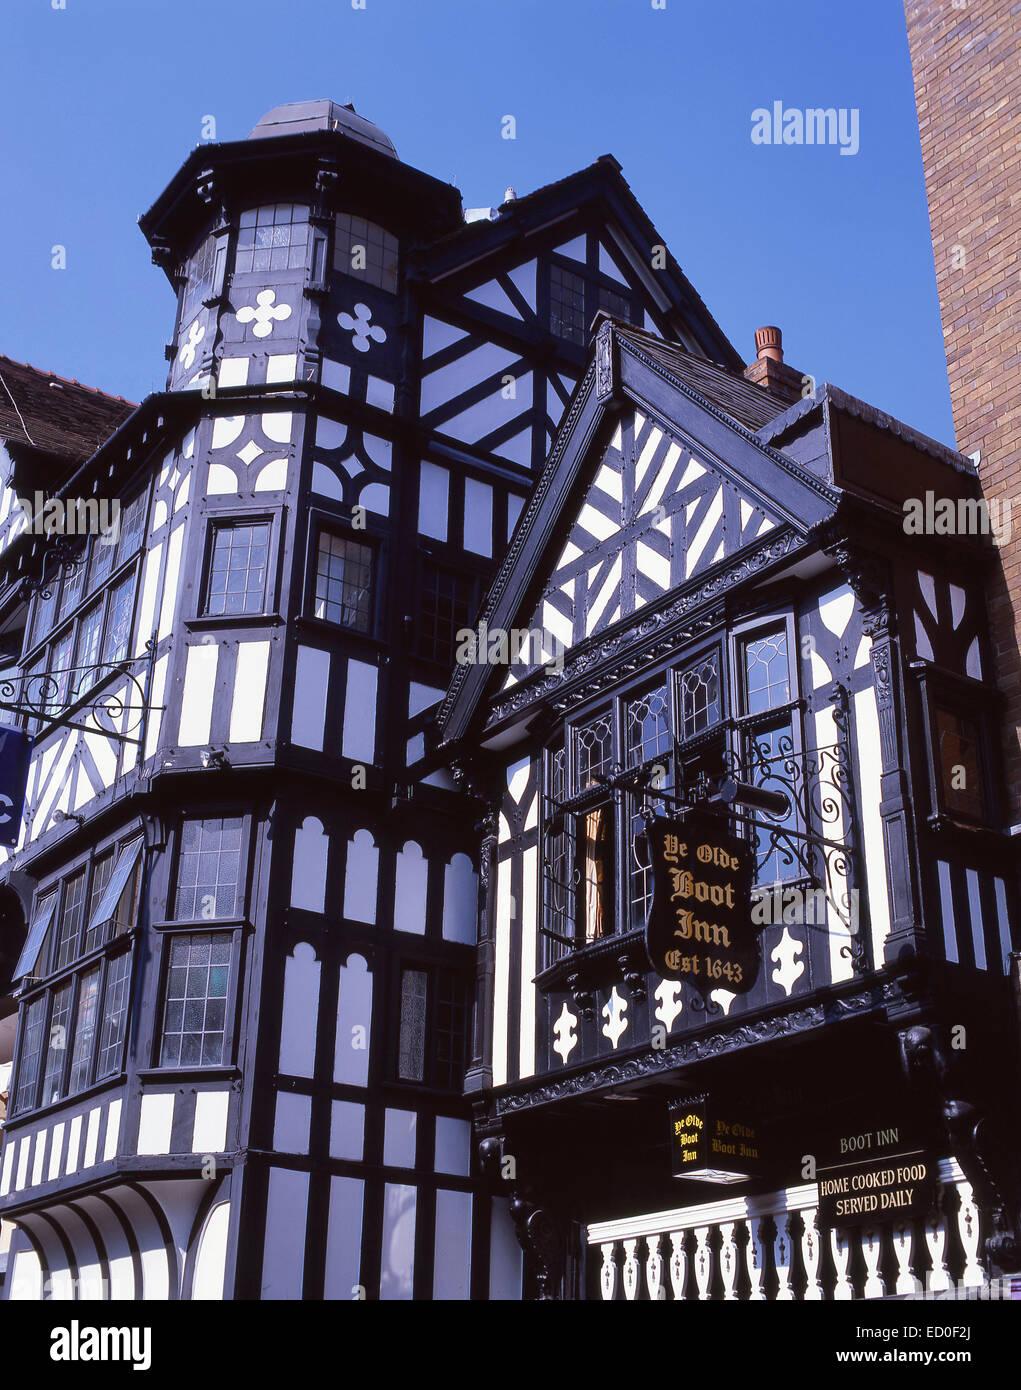 Siglo XVII Ye Olde Inn de arranque, Eastgate Street, Chester, Cheshire, Inglaterra, Reino Unido Imagen De Stock